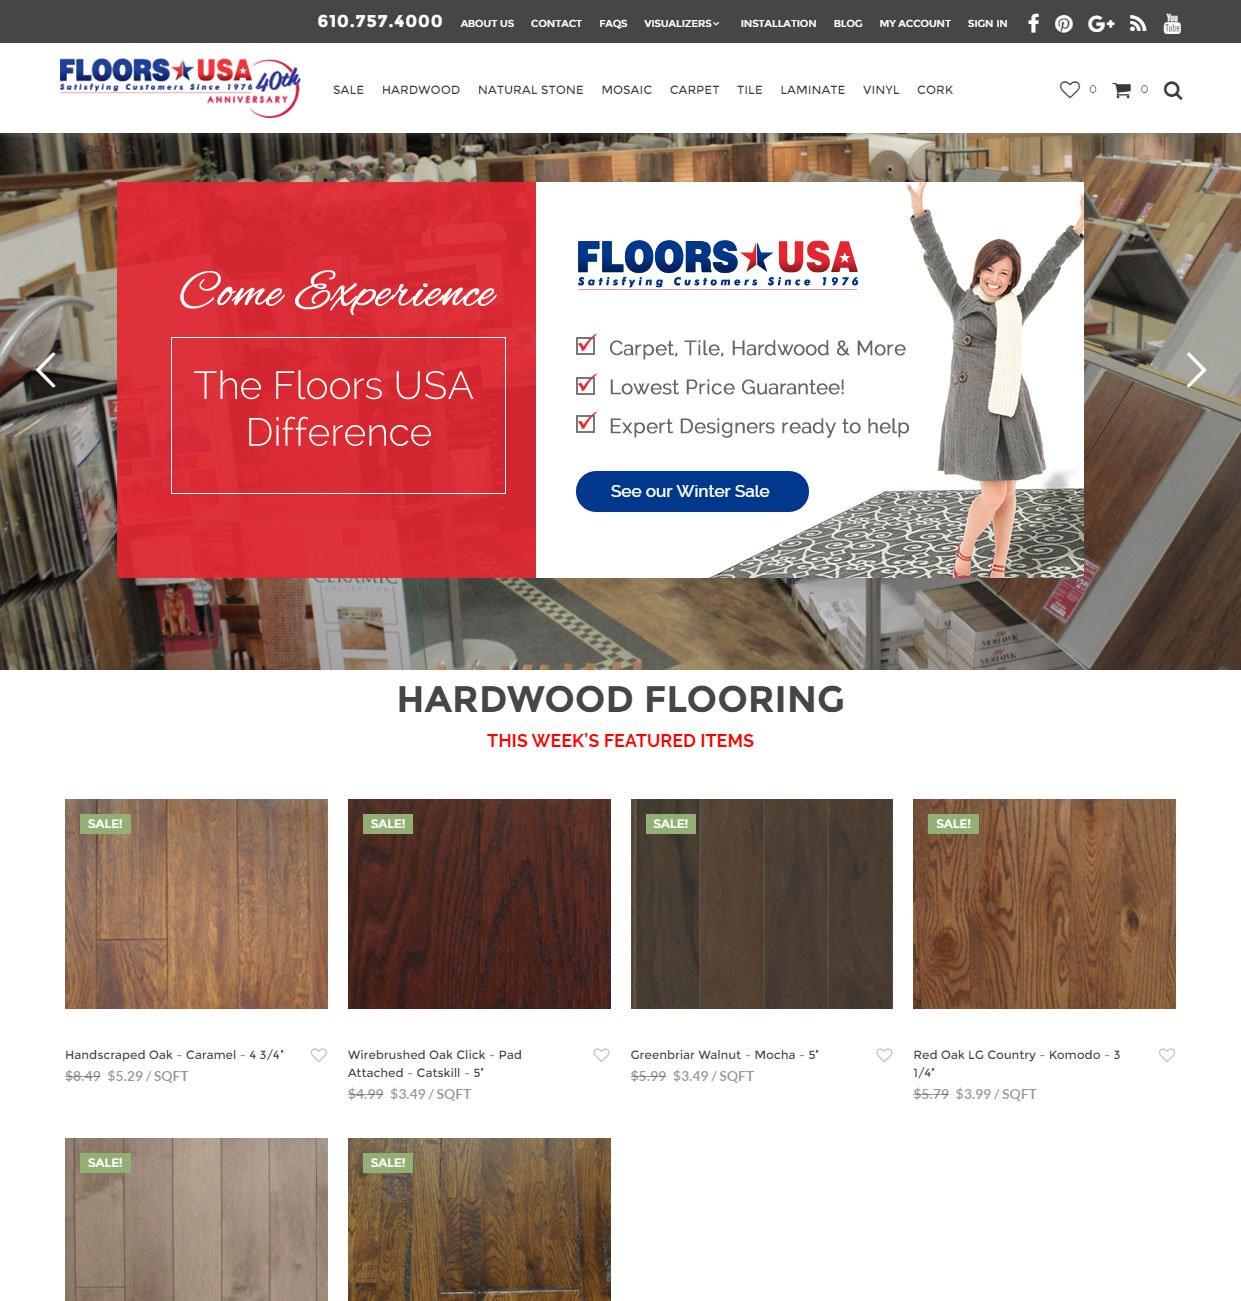 pc hardwood floors supplies of web design internet marketing google adwords local optimization plus regarding custom ecommerce wordpress site for flooring store in philadelphia